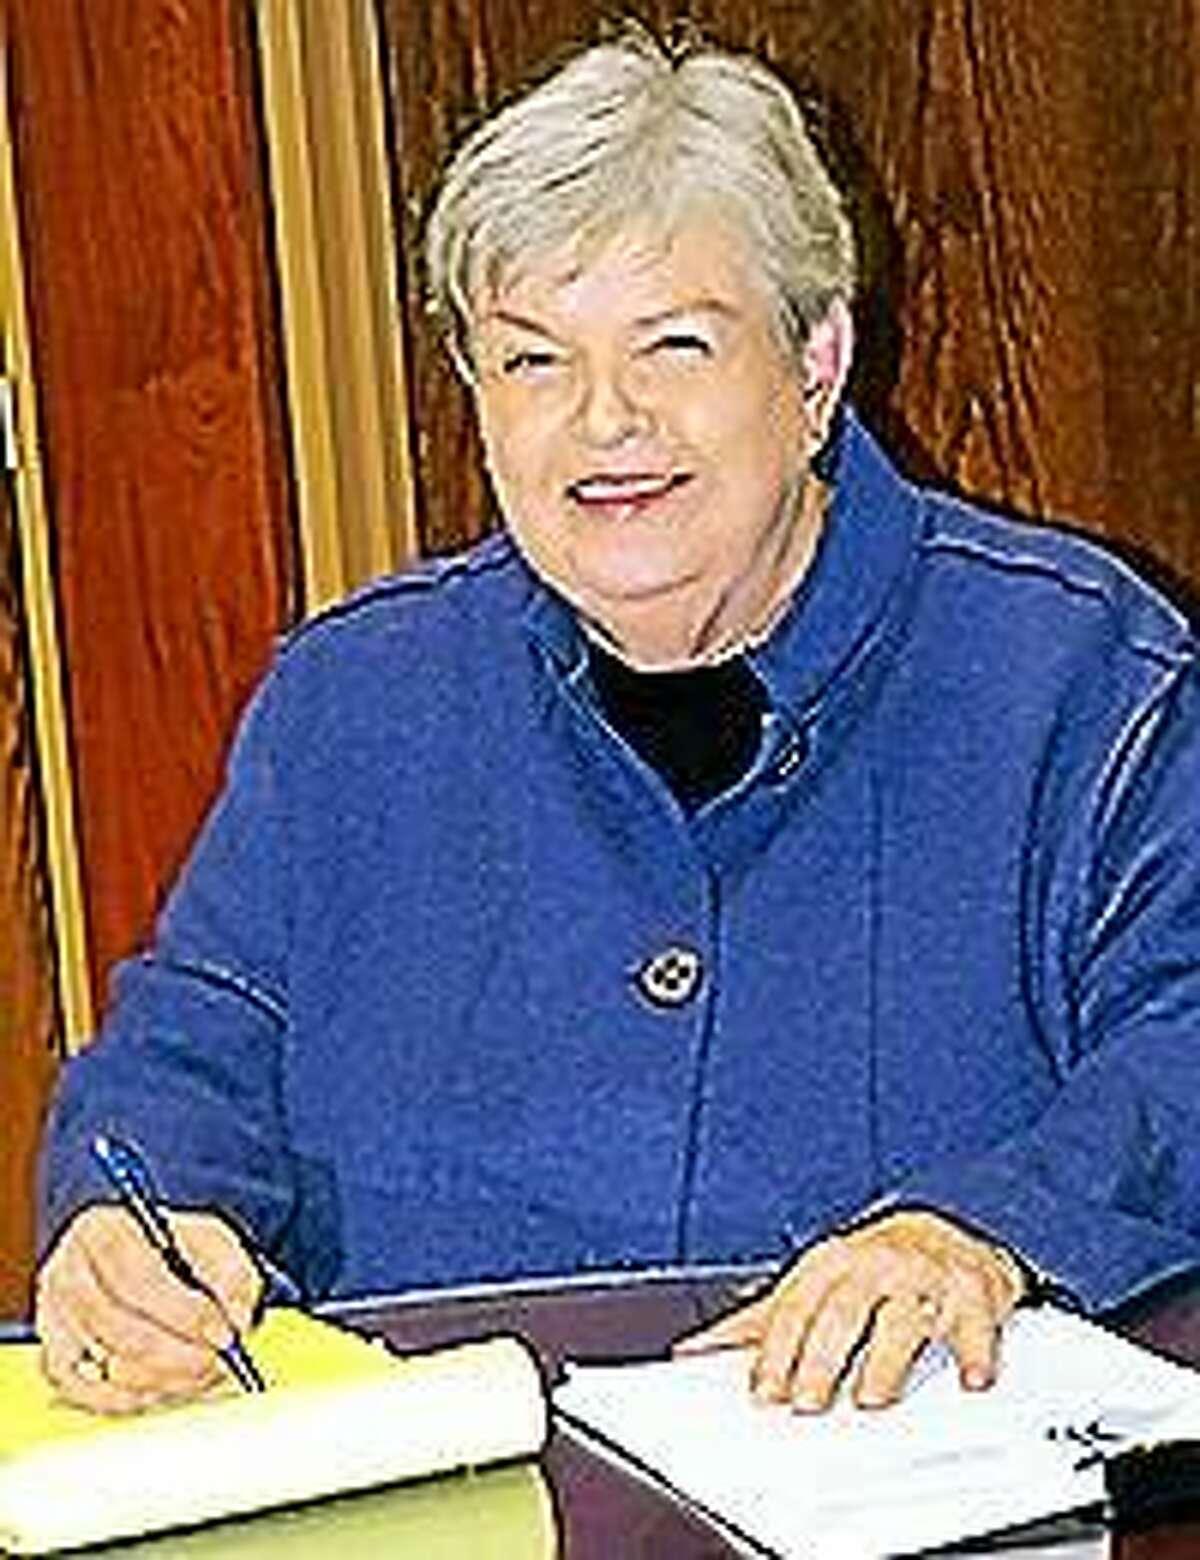 State Labor Commissioner Sharon Palmer